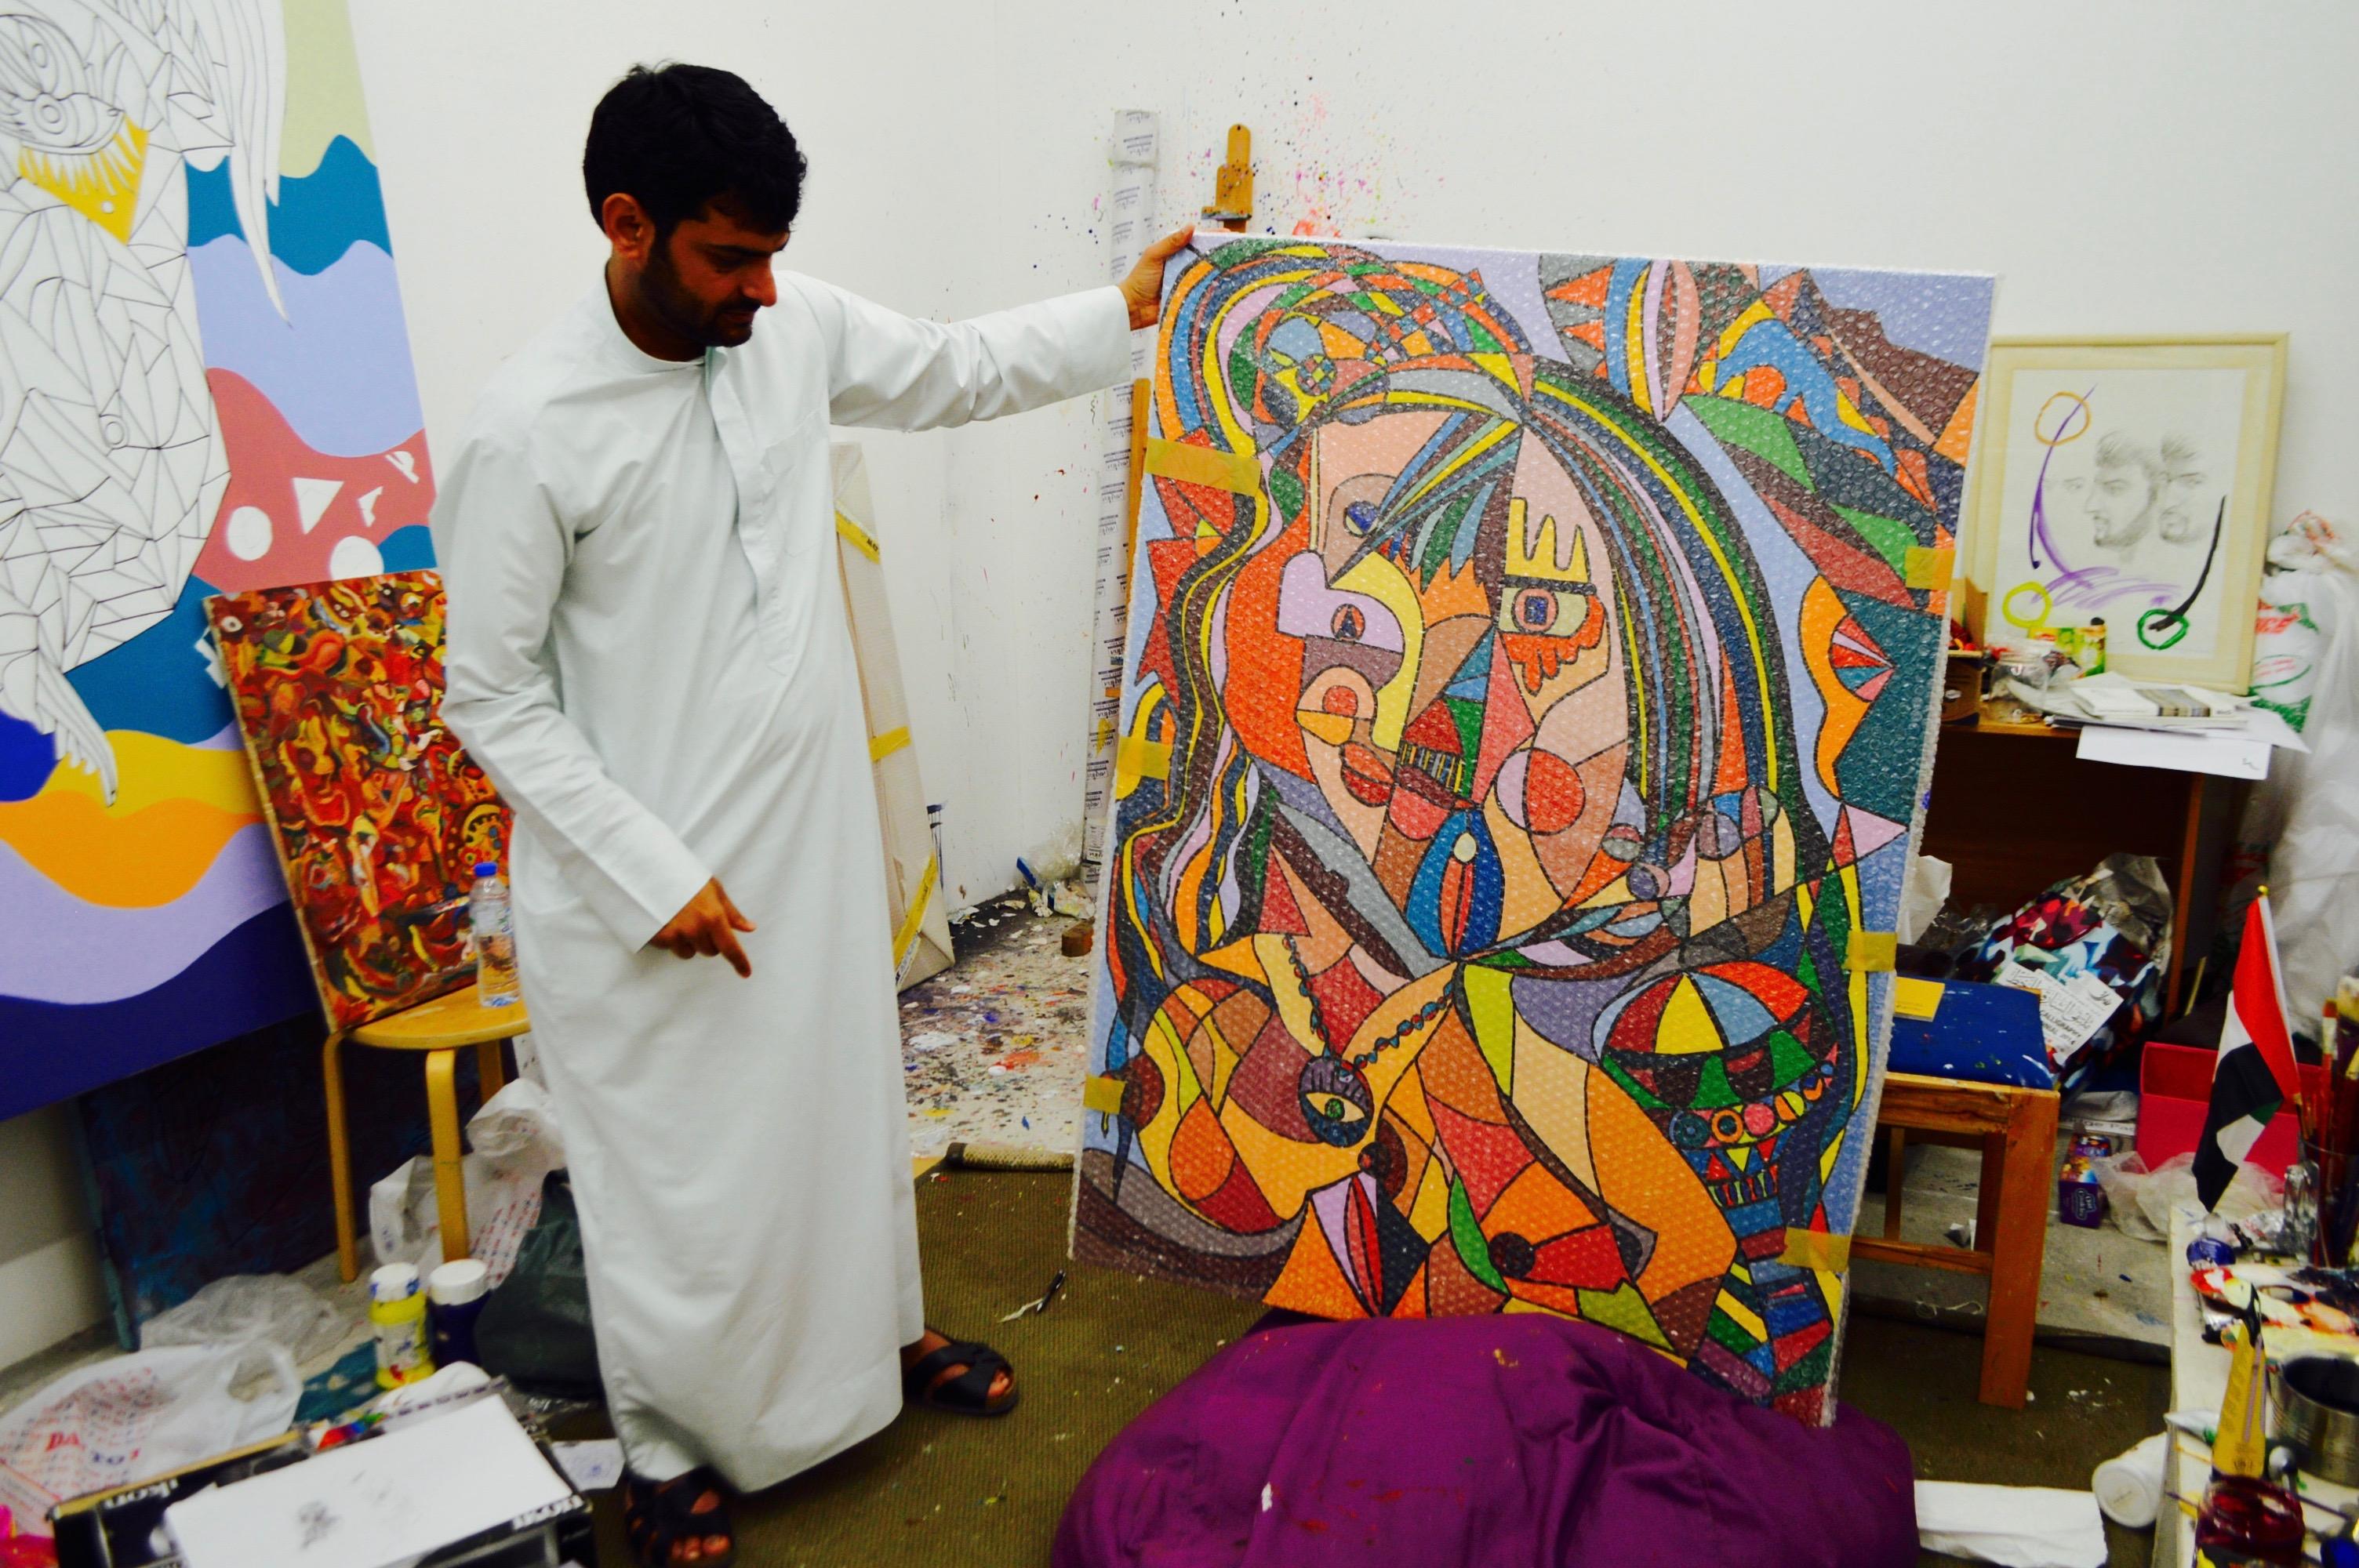 Abdul Rahman Al Maa'ini in his studio with a work in progress. Courtesy of the Barjeel Foundation.